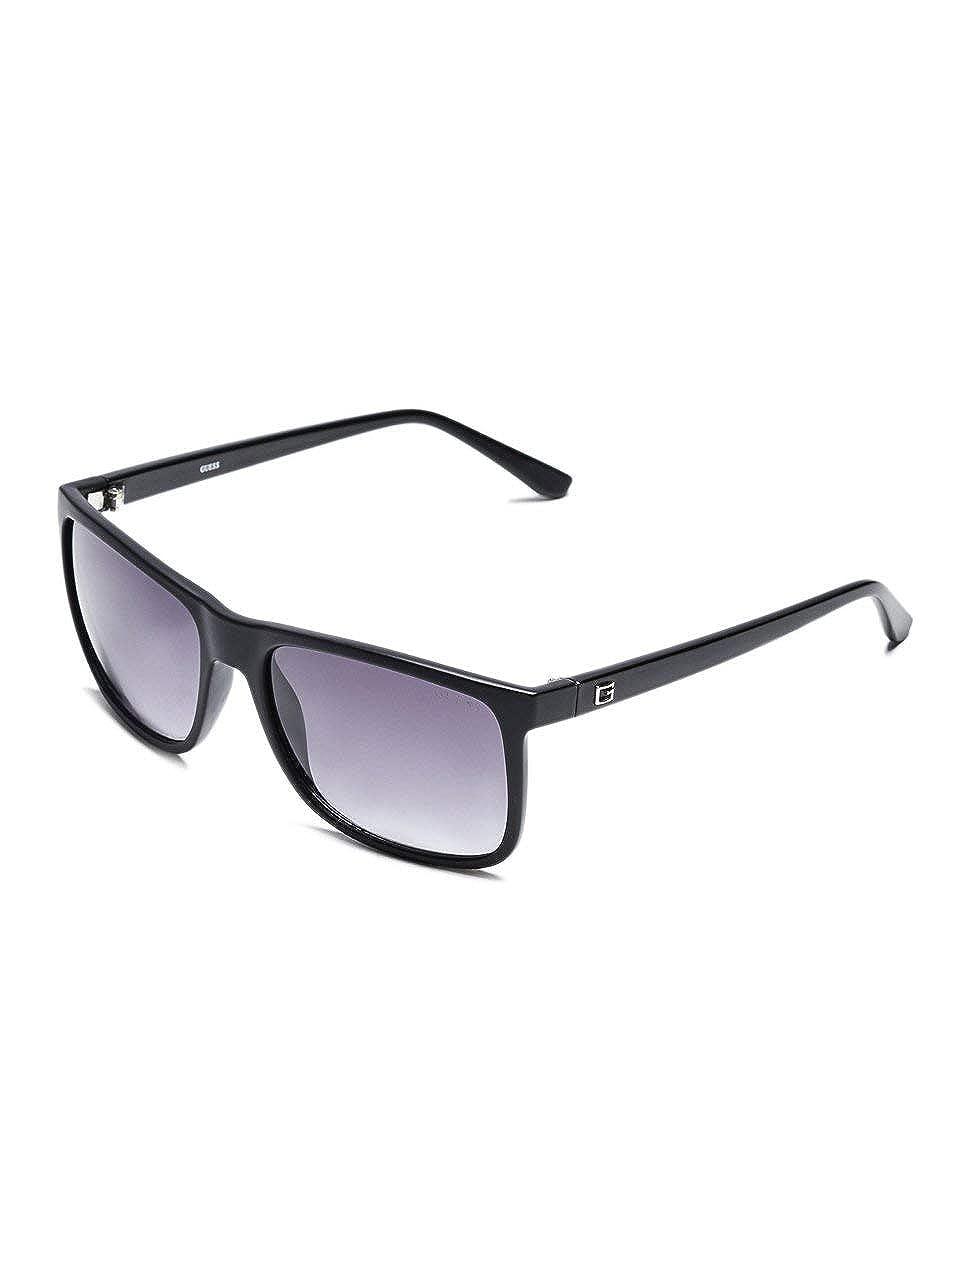 GUESS Factory Mens Matte Plastic Square Sunglasses